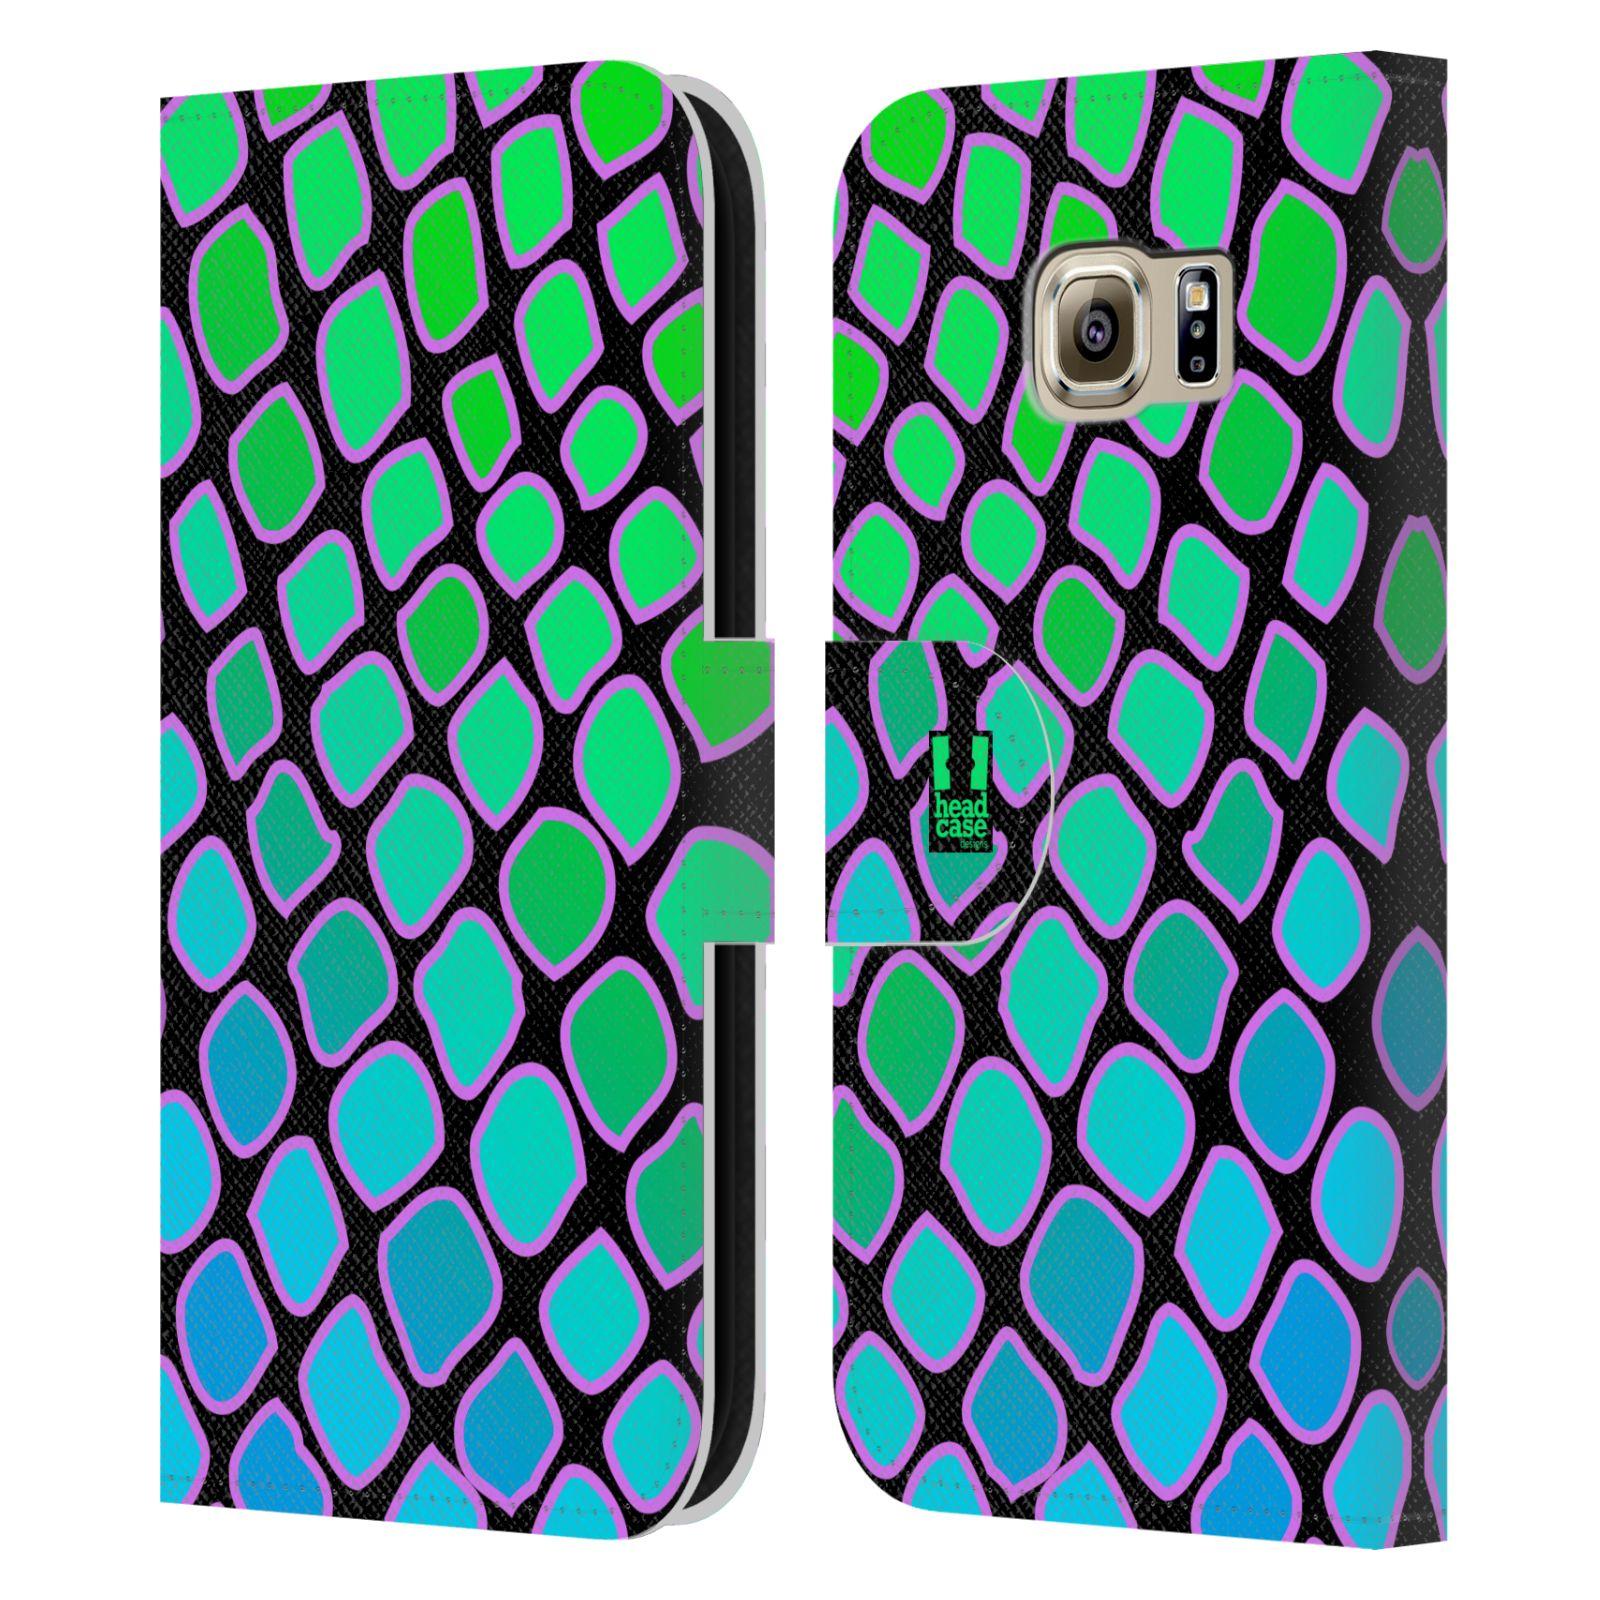 HEAD CASE Flipové pouzdro pro mobil Samsung Galaxy S6 (G9200) Zvířecí barevné vzory vodní had modrá a zelená barva AQUA